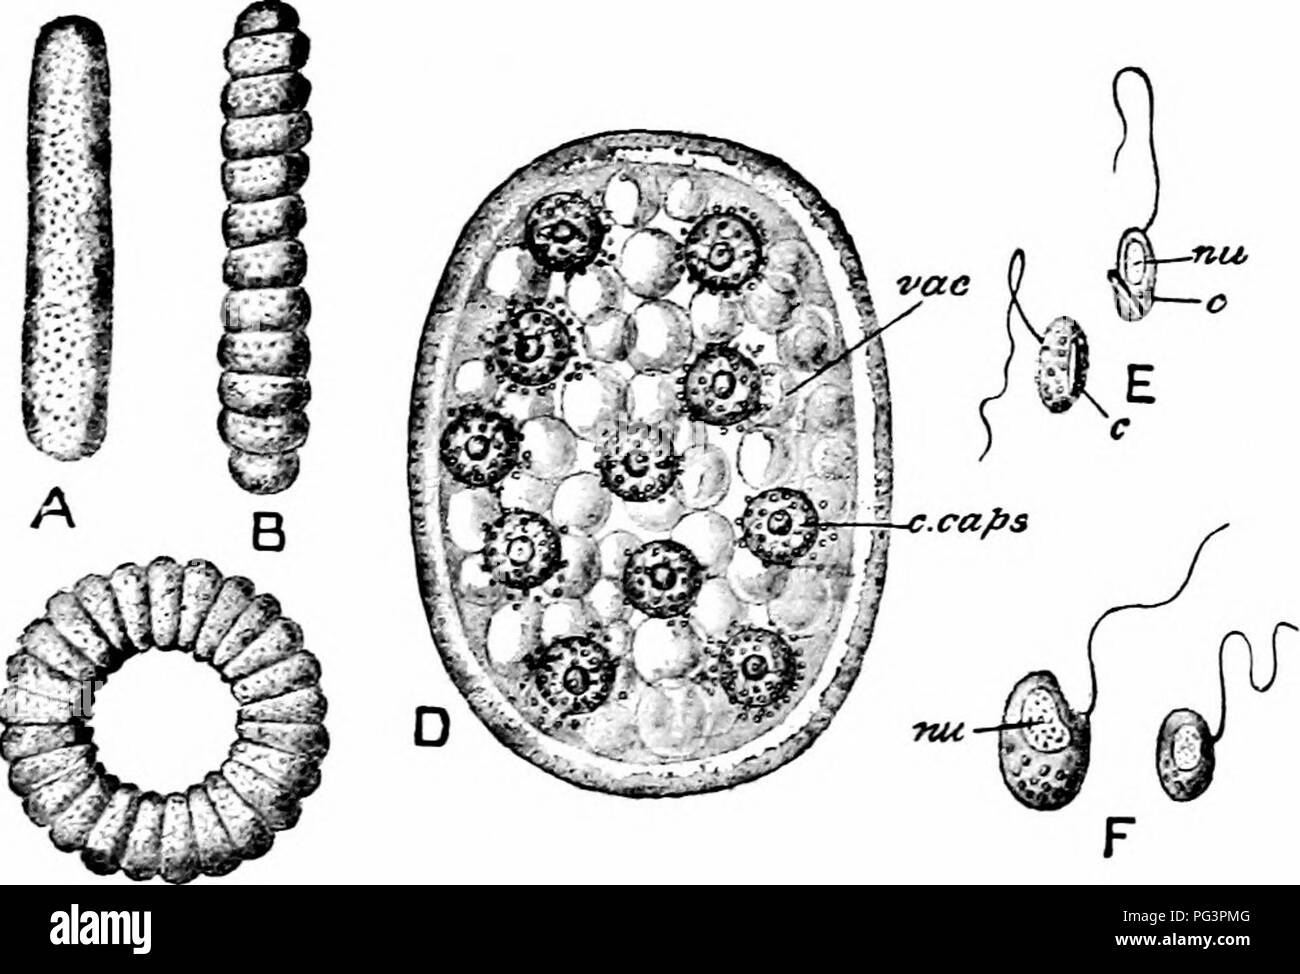 is protozoa a phylum